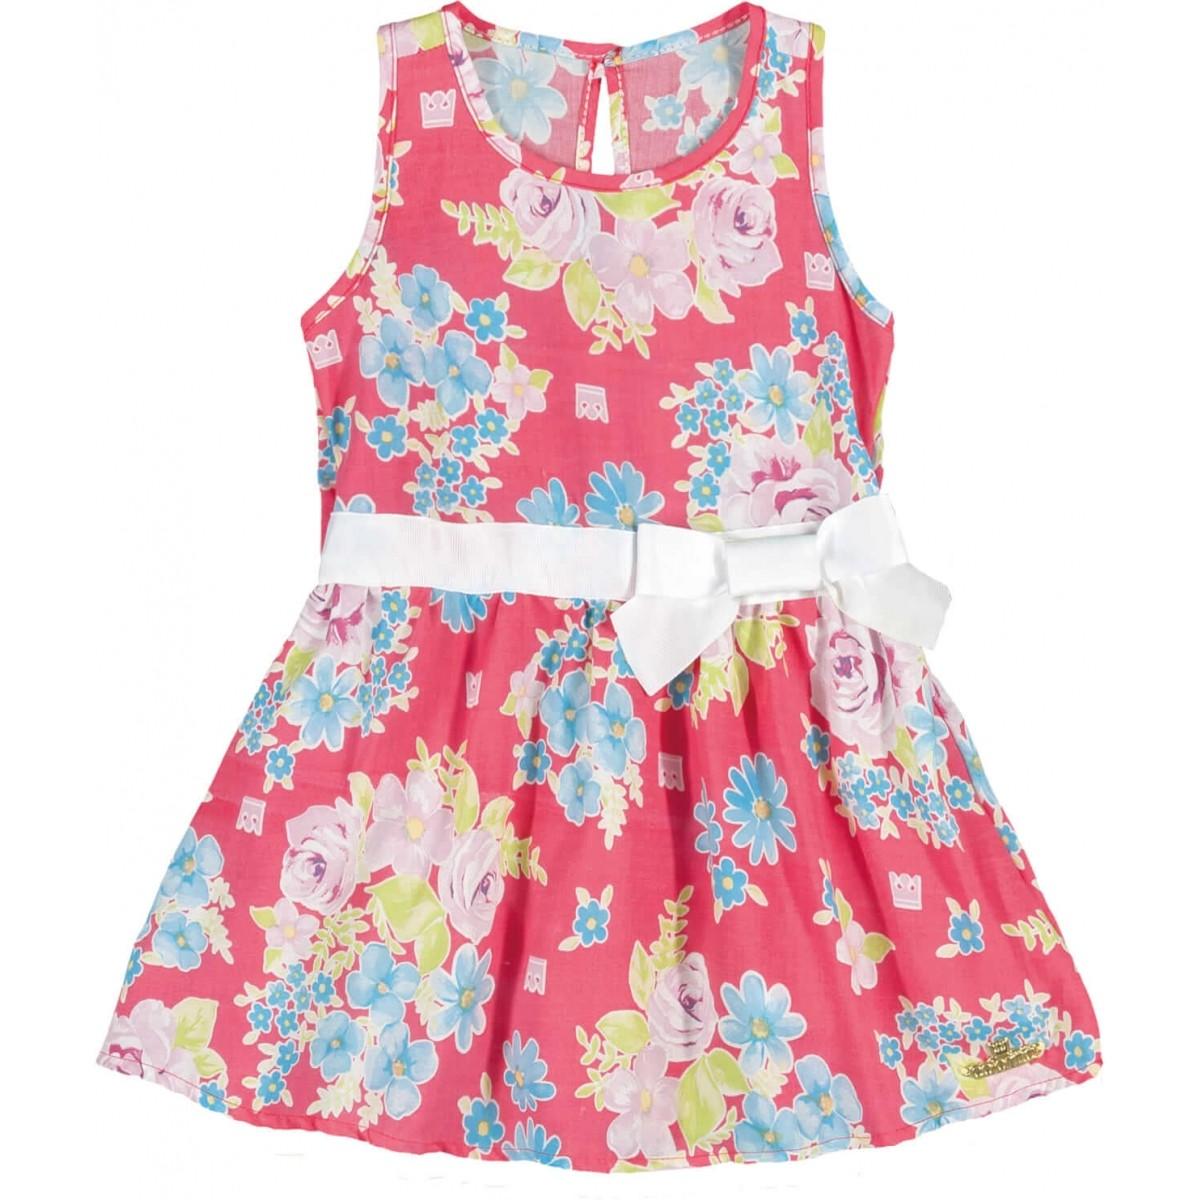 Vestido Infantil Feminino Vermelho Verão Colorittá  9aad58cc2ed81